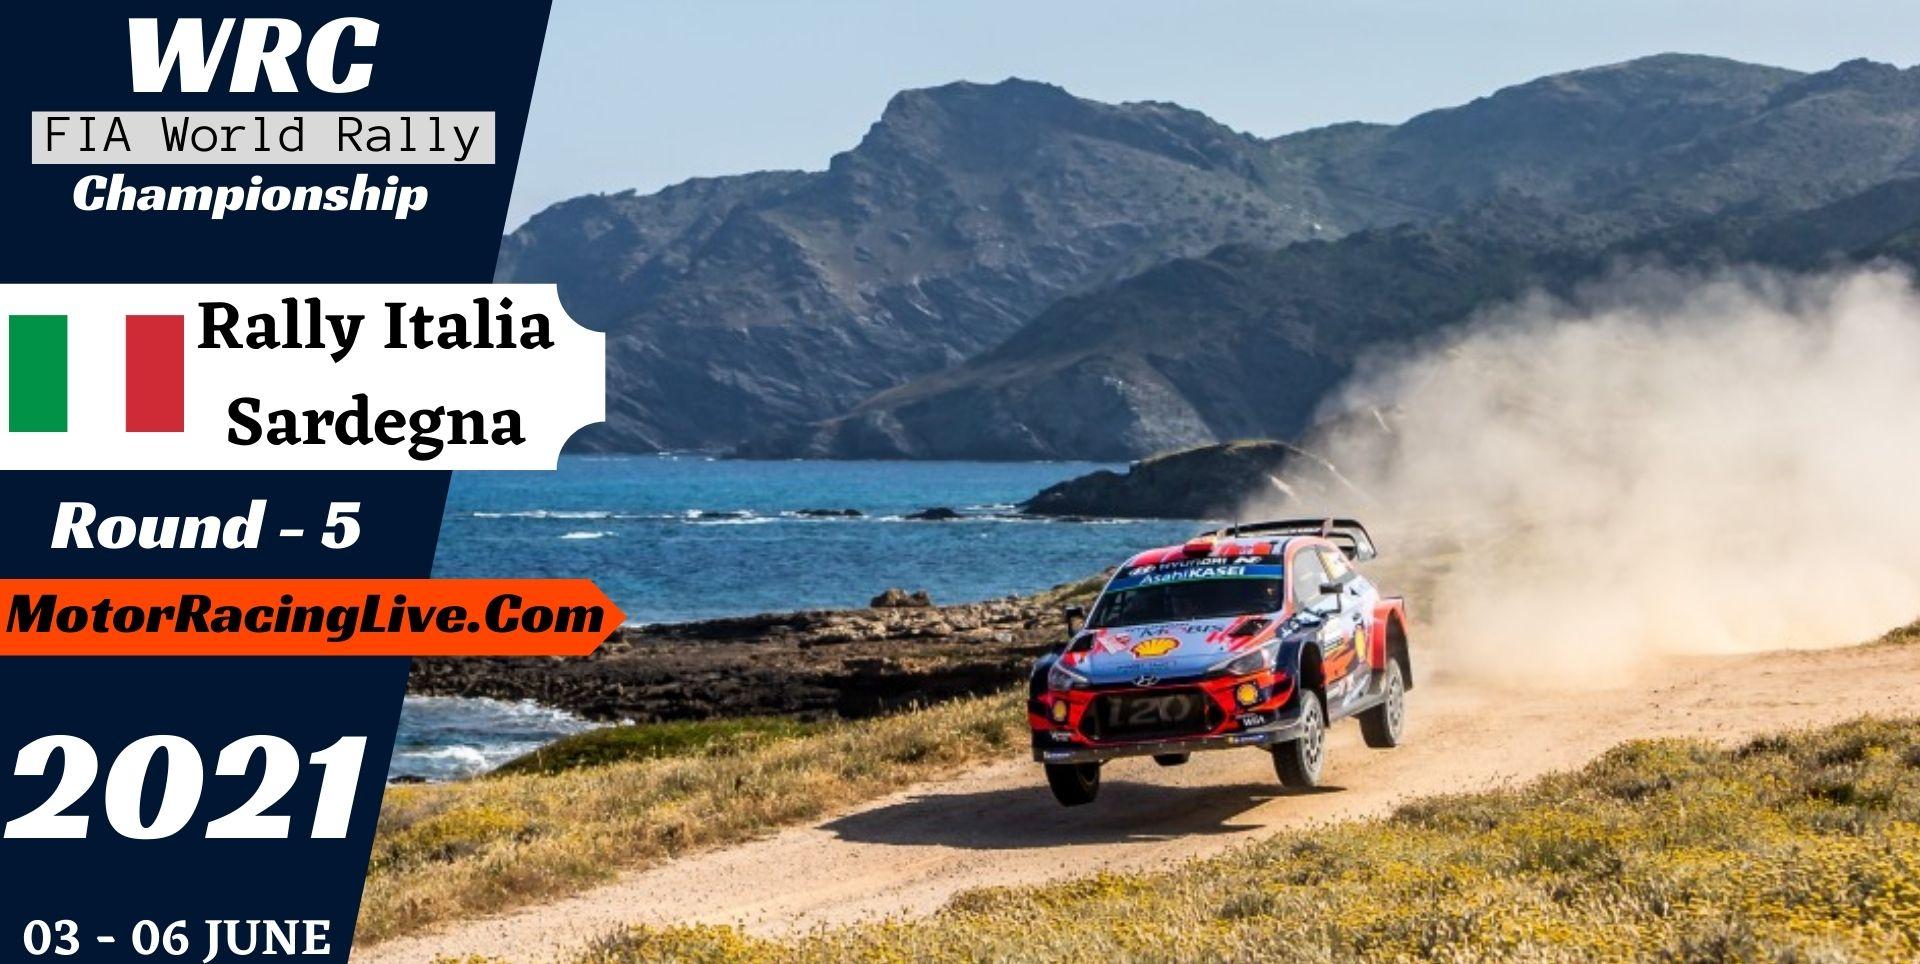 WRC Rally Italia Sardegna Round 5 Live Stream 2021